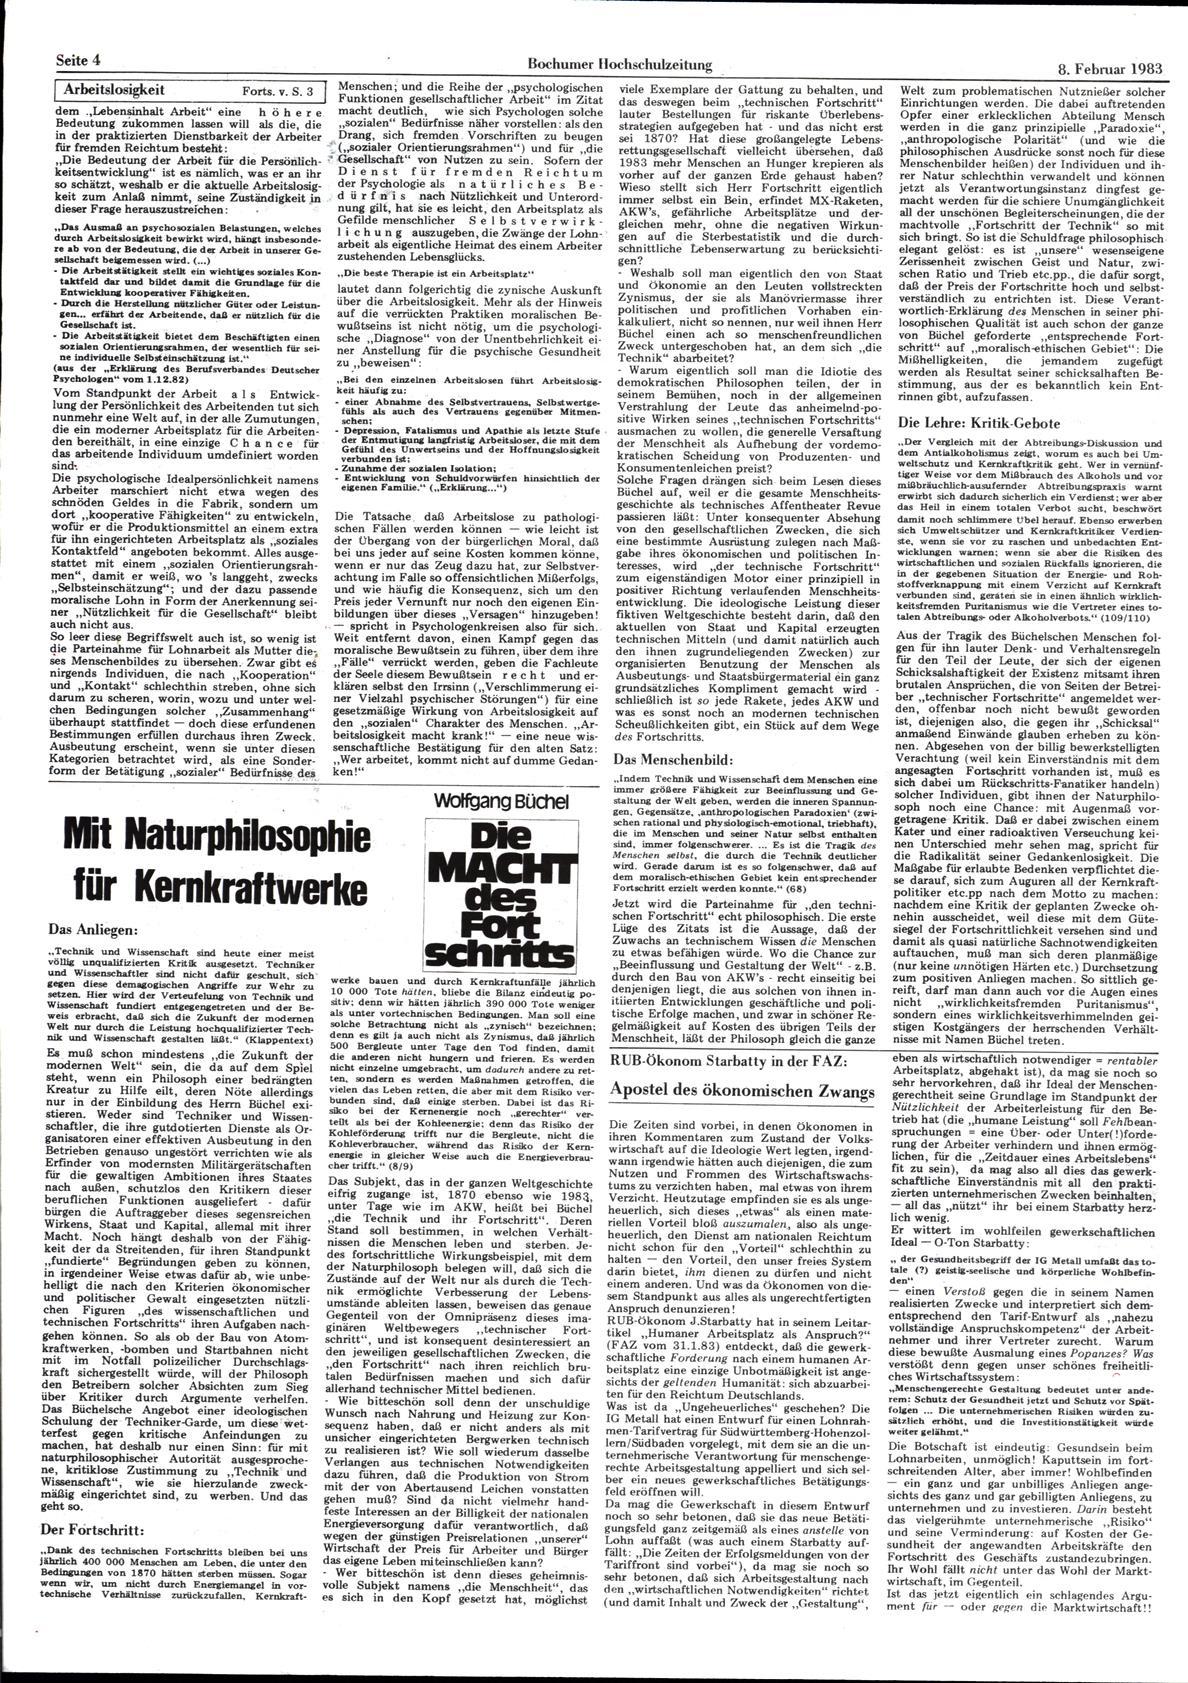 Bochum_BHZ_19830208_066_004